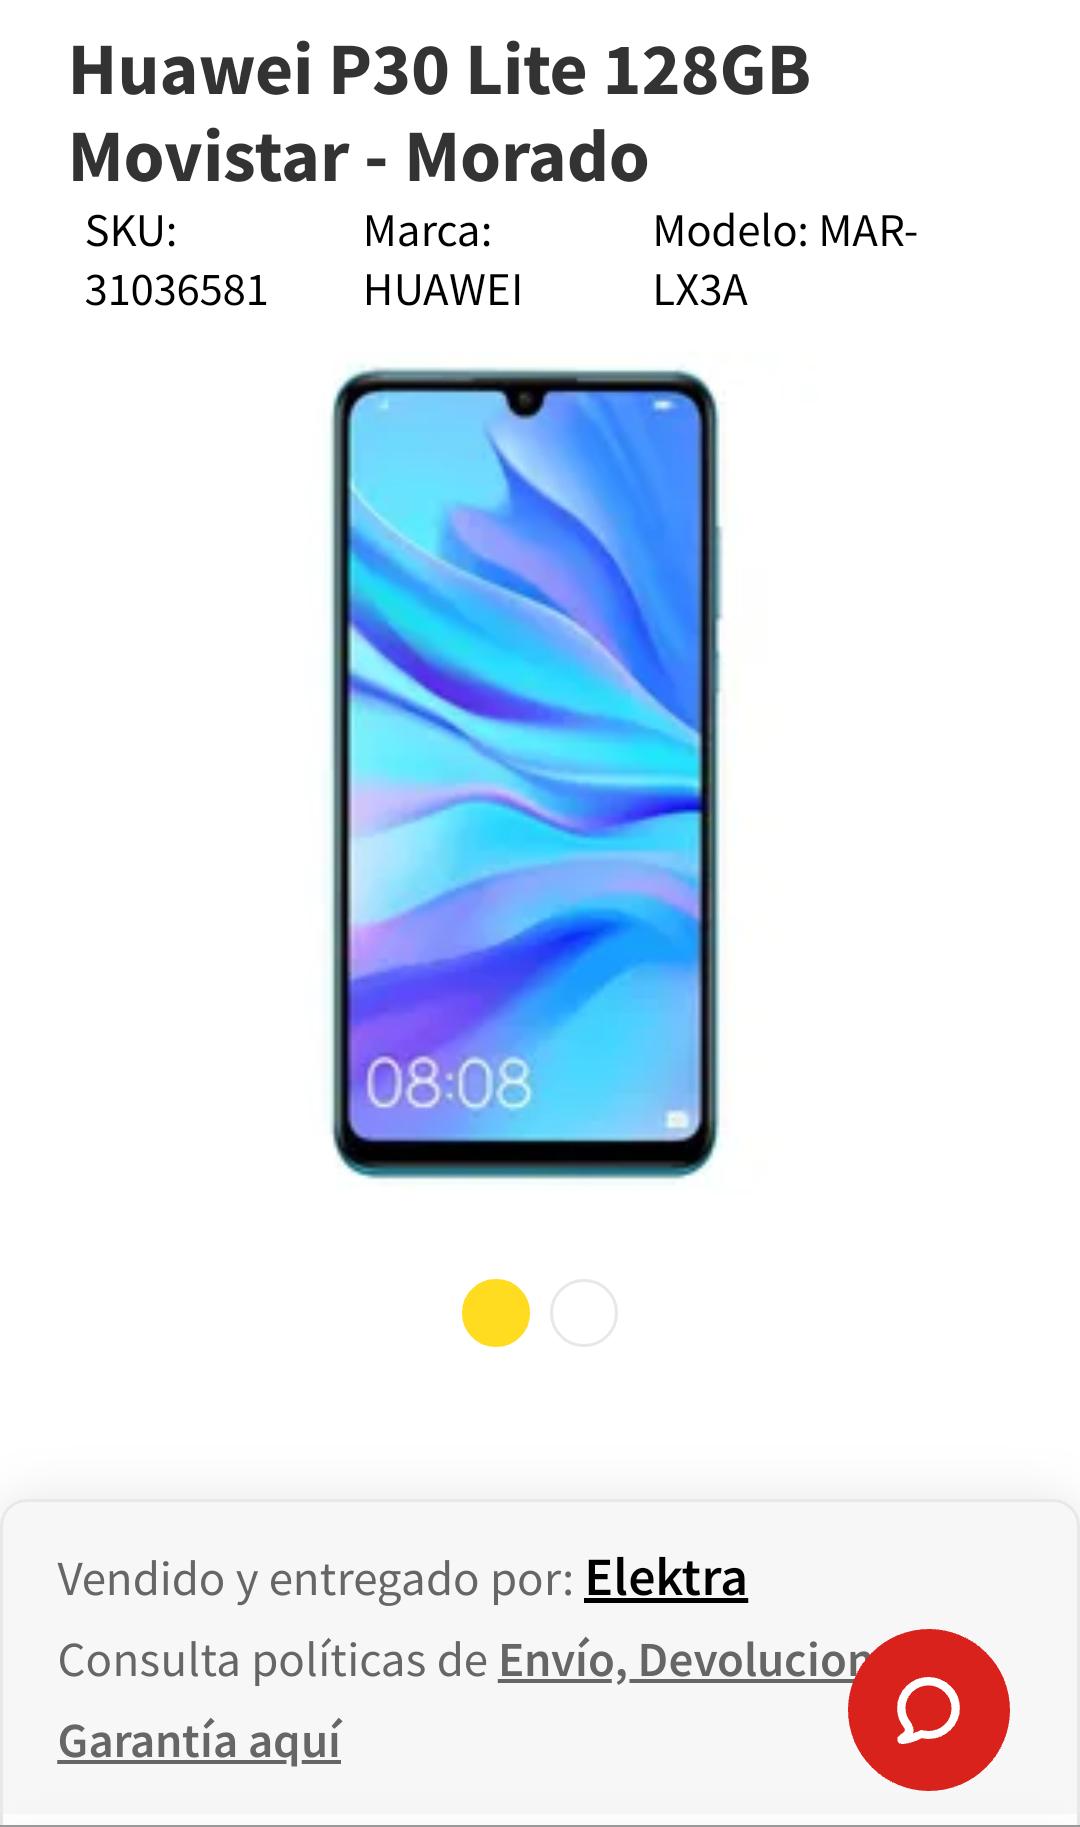 Elektra: Huawei P30 Lite 128Gb (pagando con Banco Azteca)